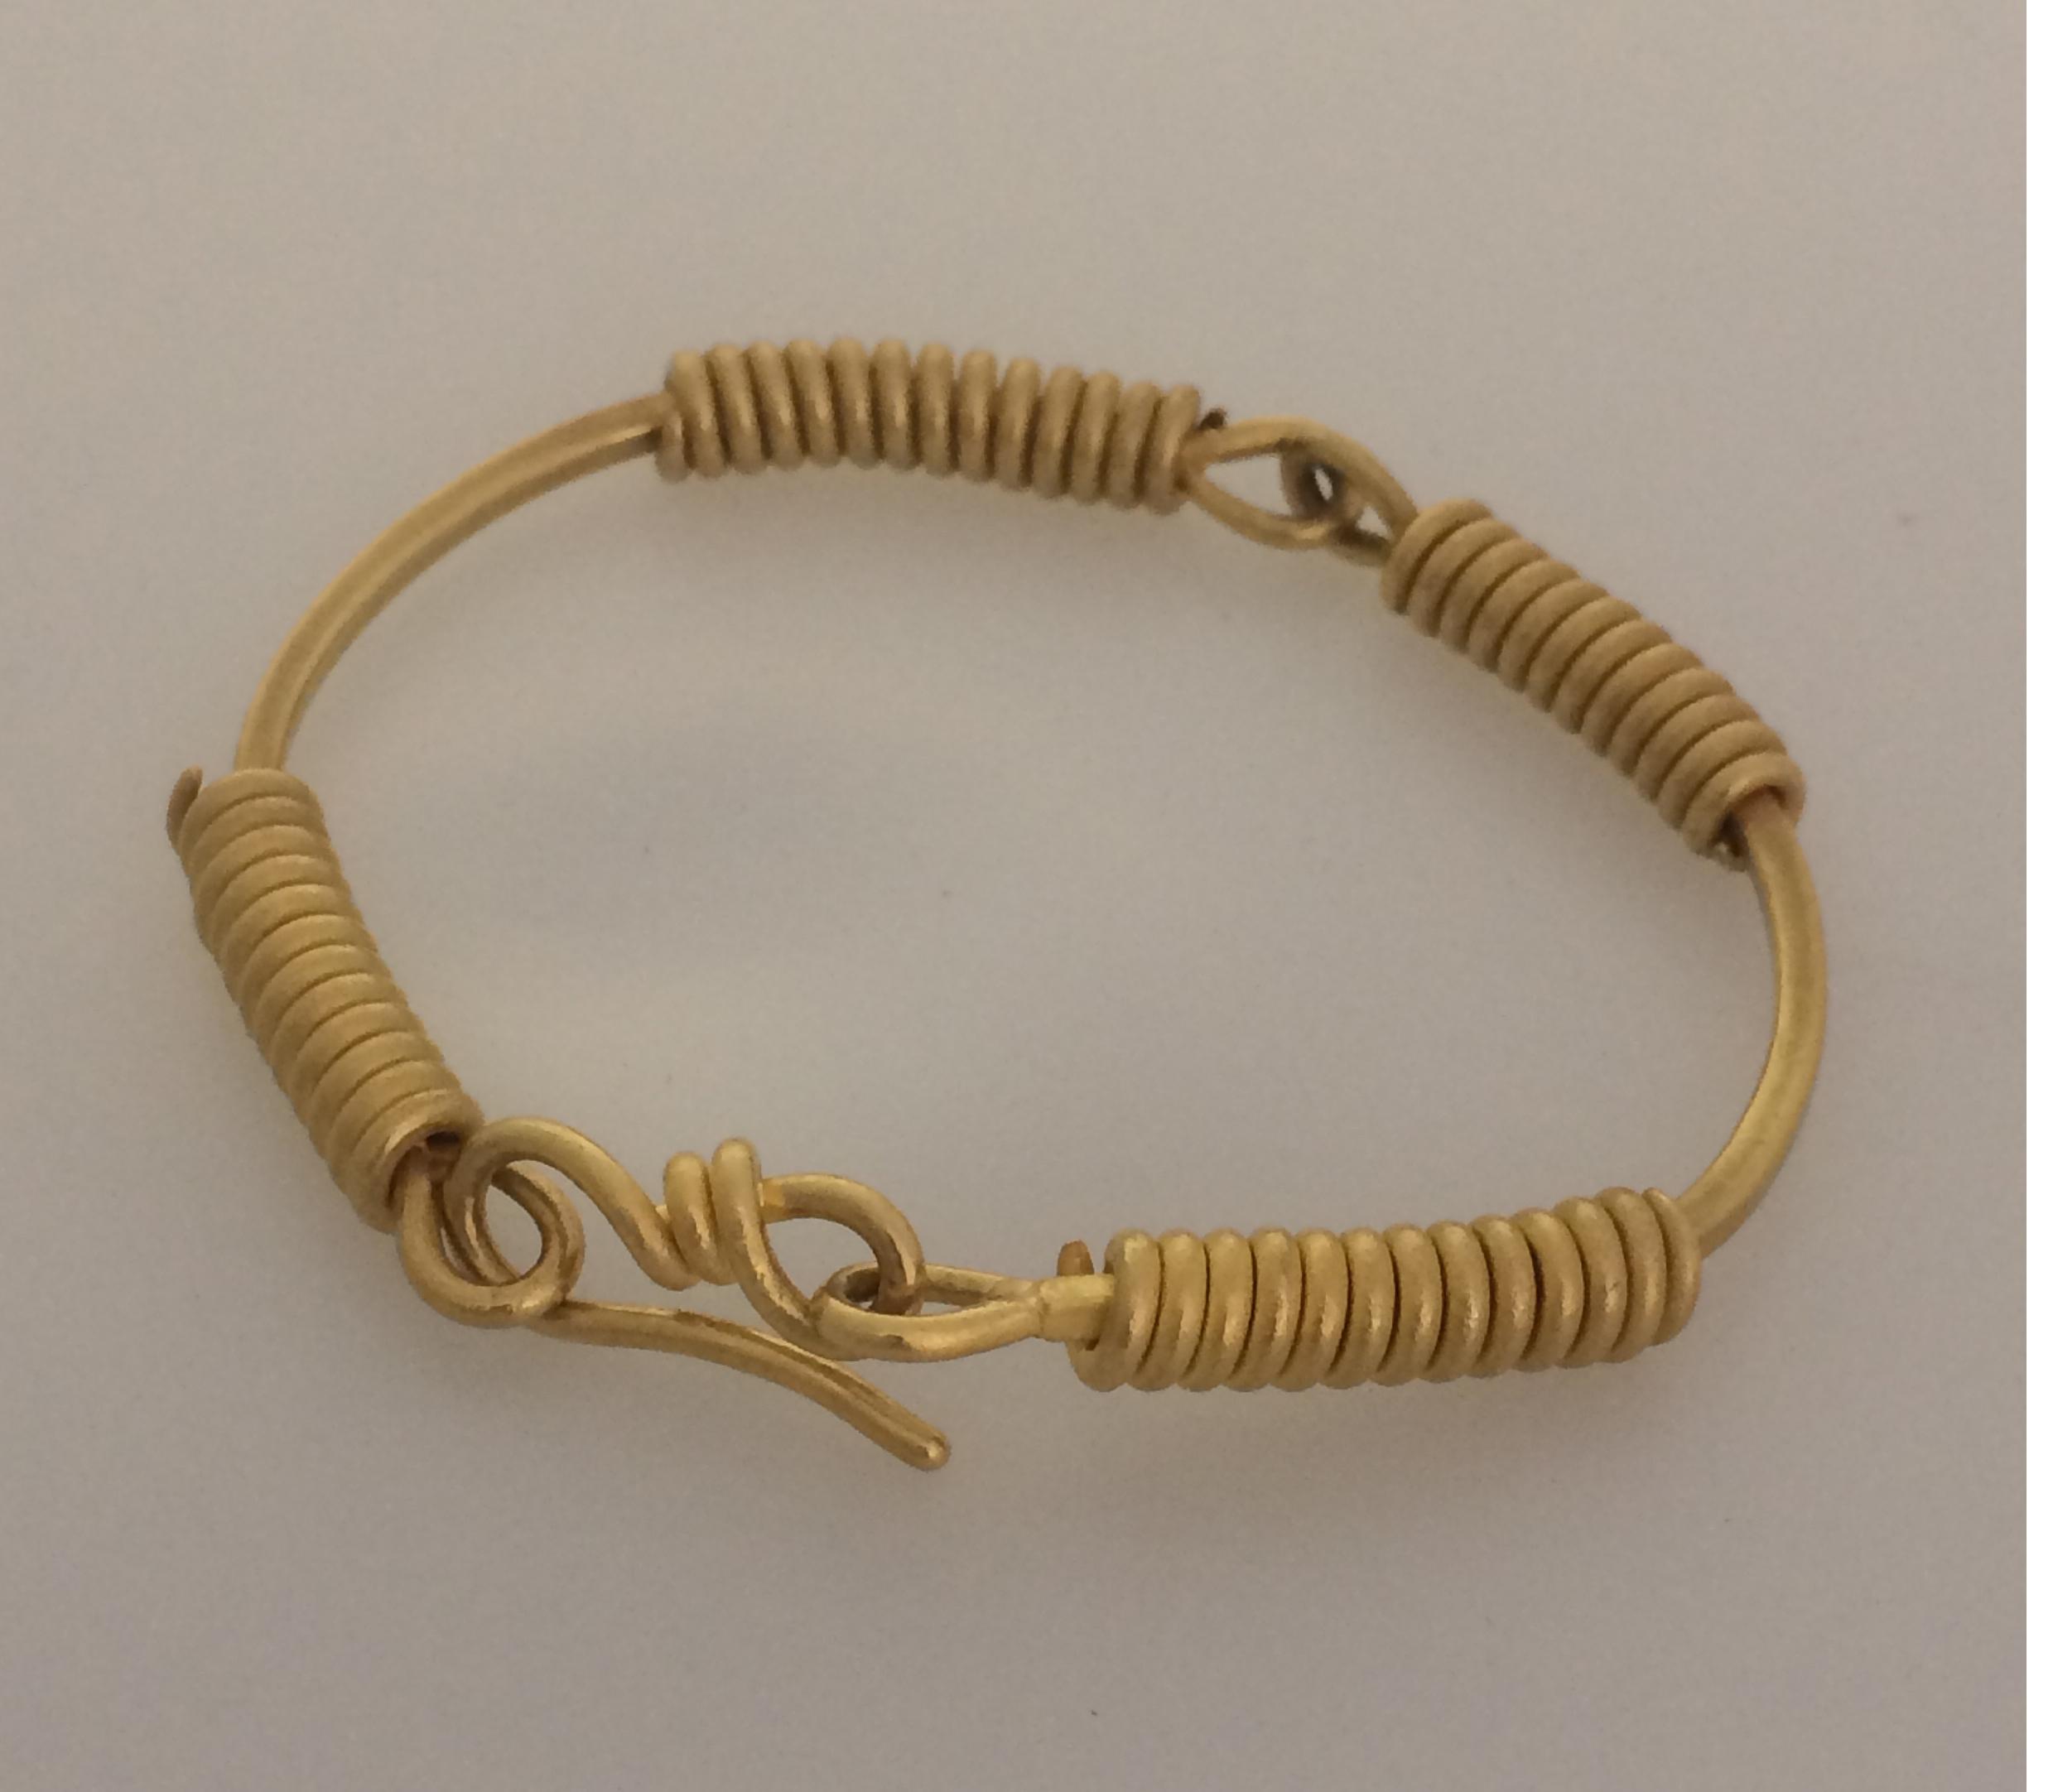 Advanced student's work. Ancient style spiraled wire bracelet in 22 karat gold.